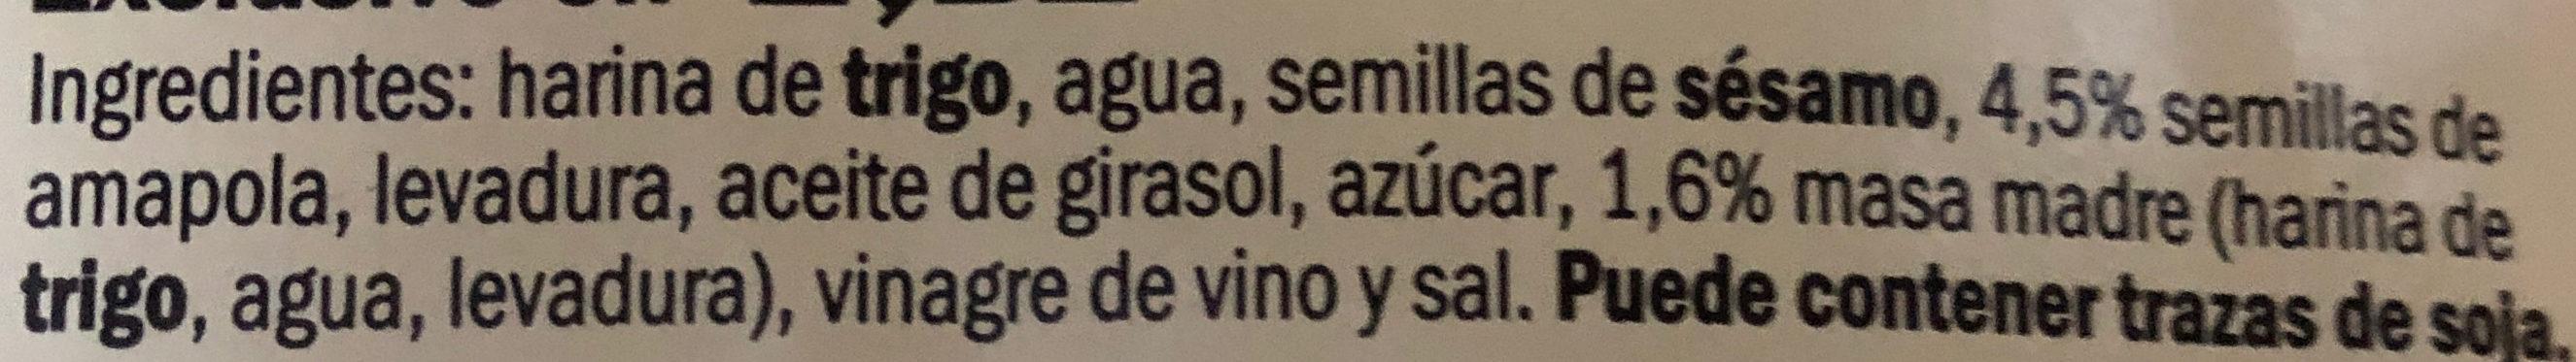 Pan semillas de Amapola - Ingrediënten - es